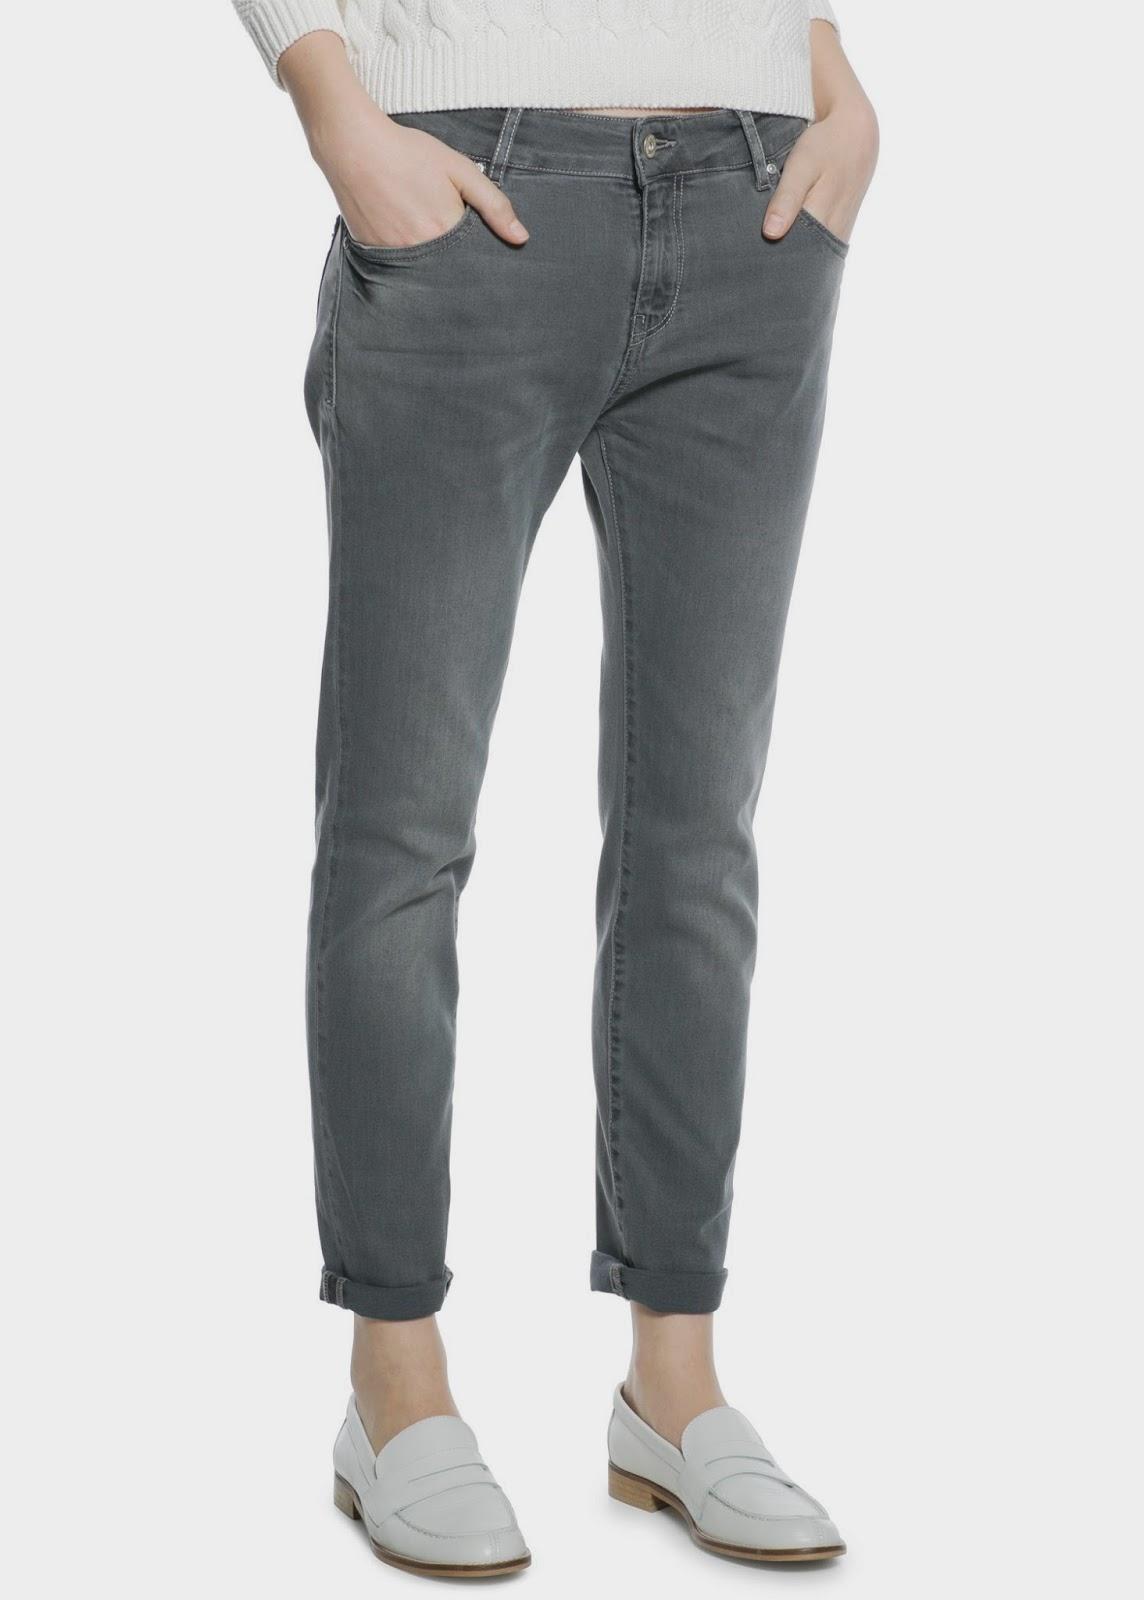 mango grey jeans